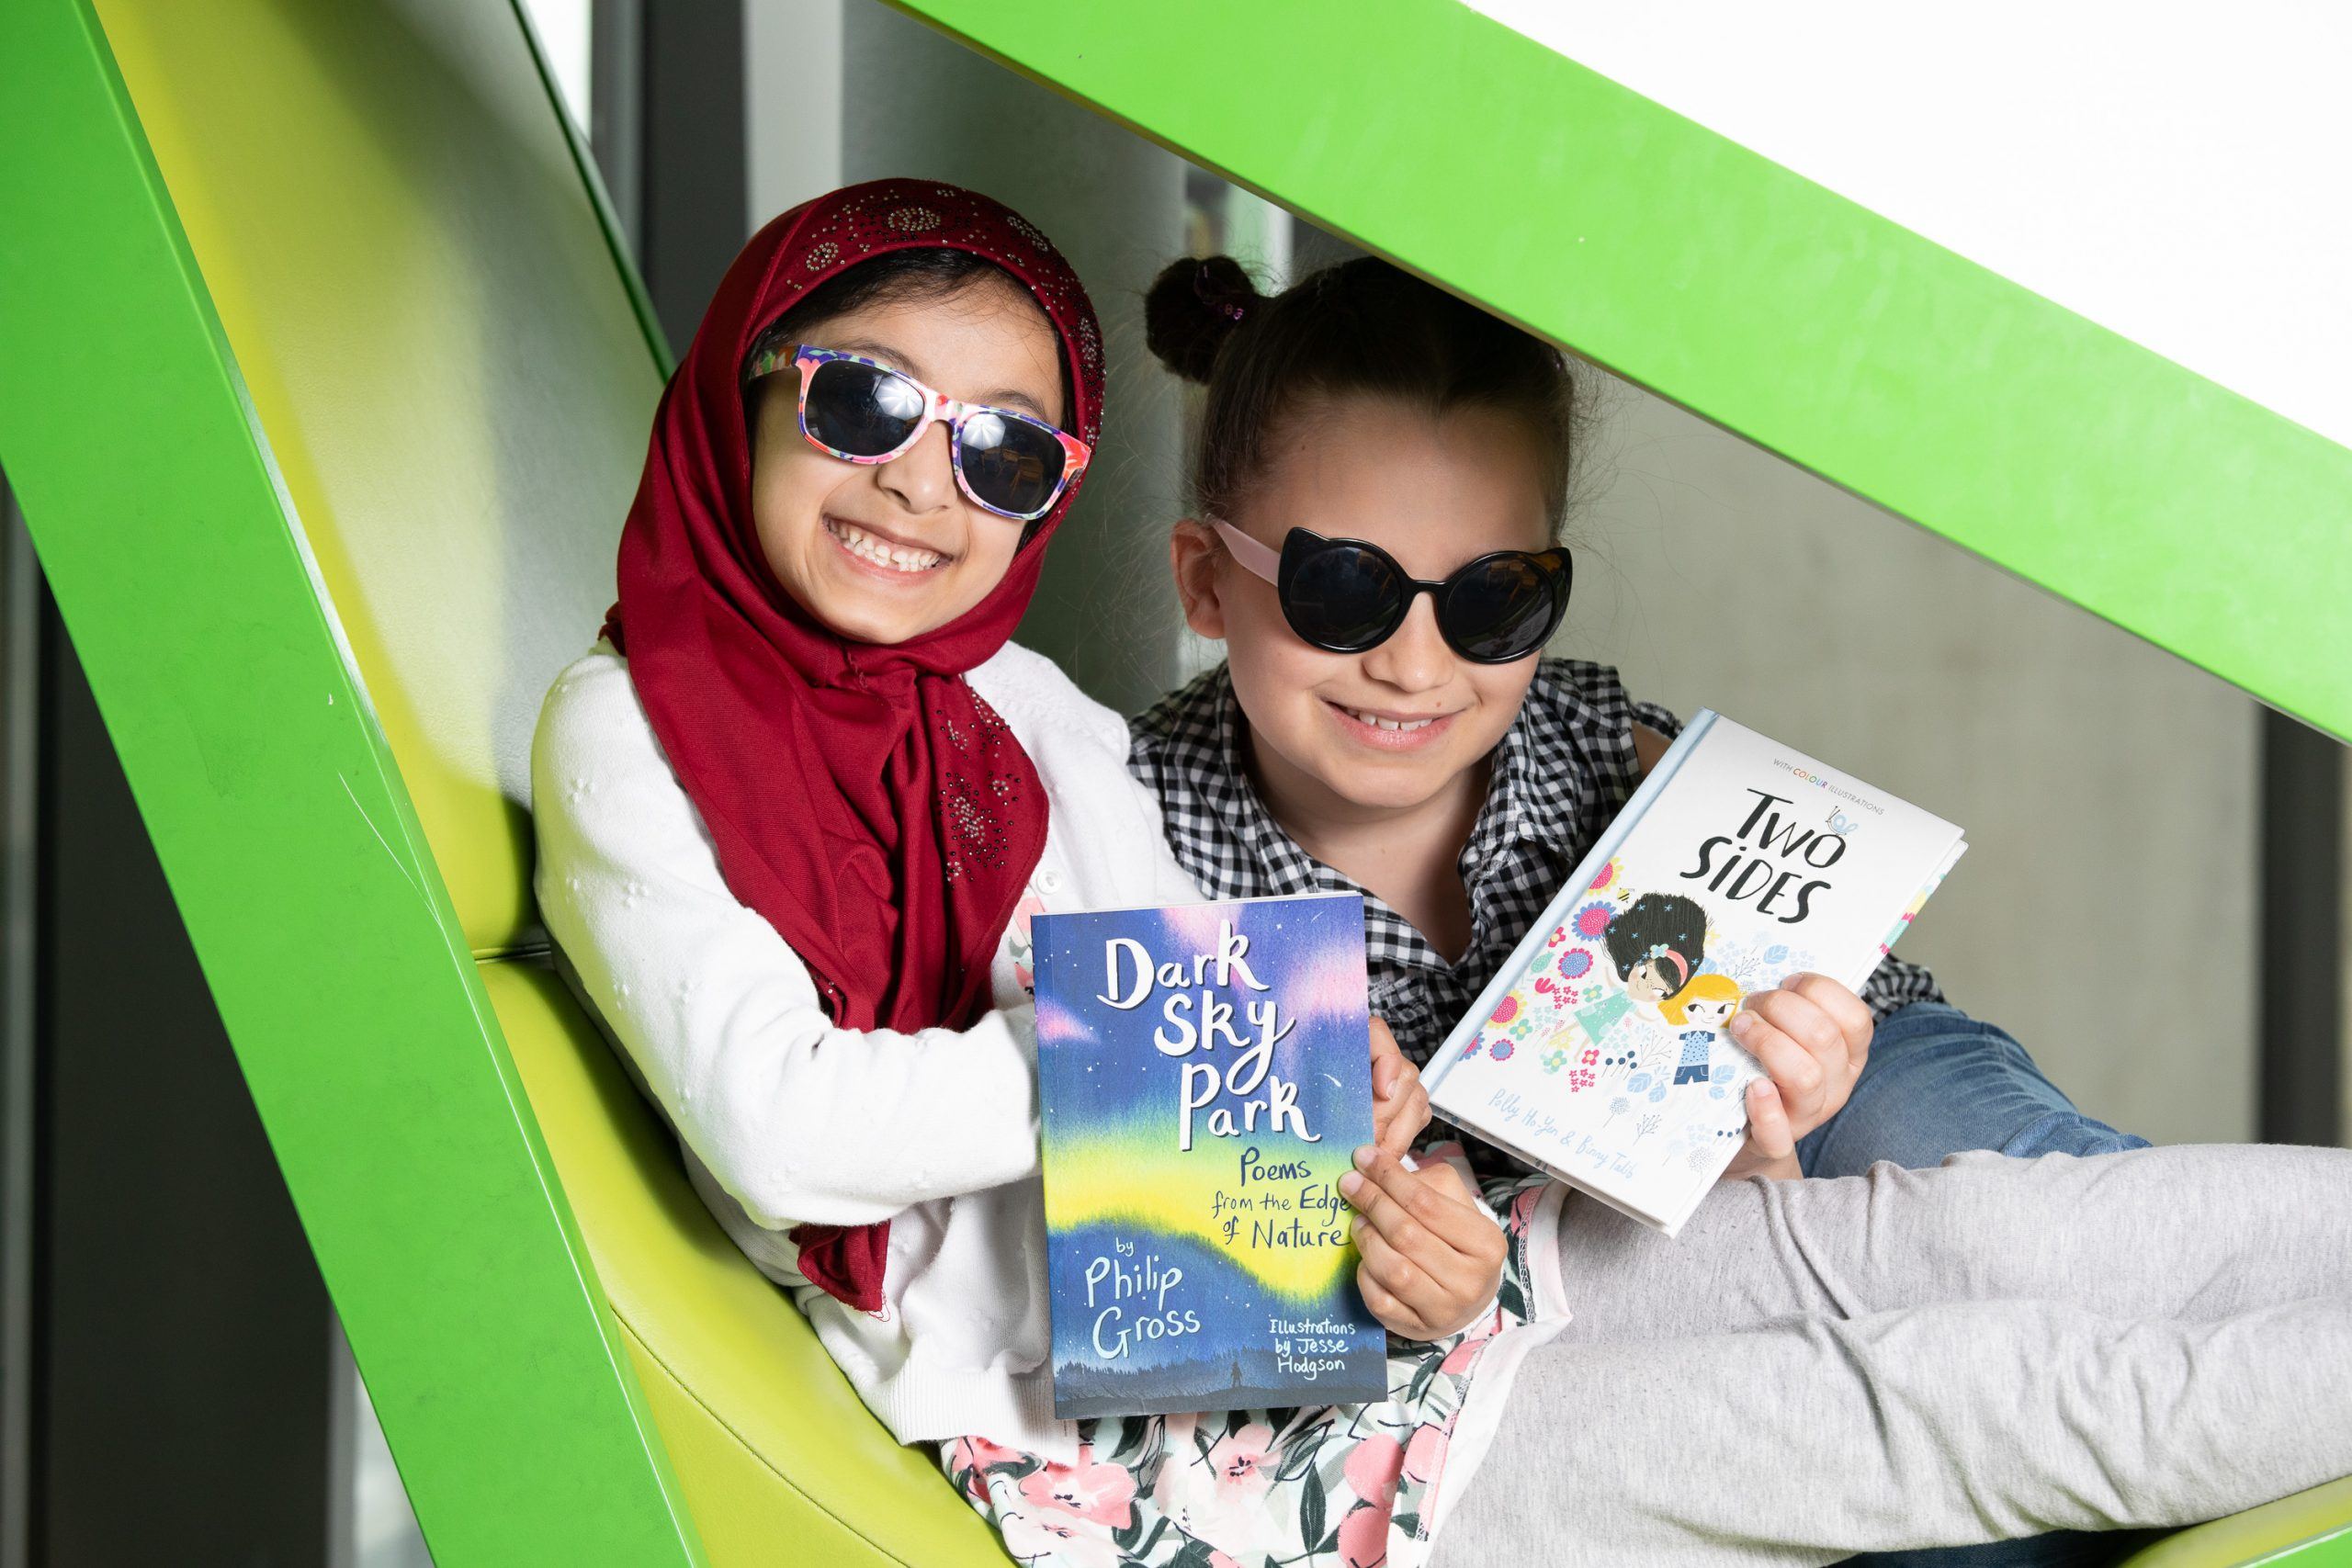 Two girls wearing sunglasses reading books